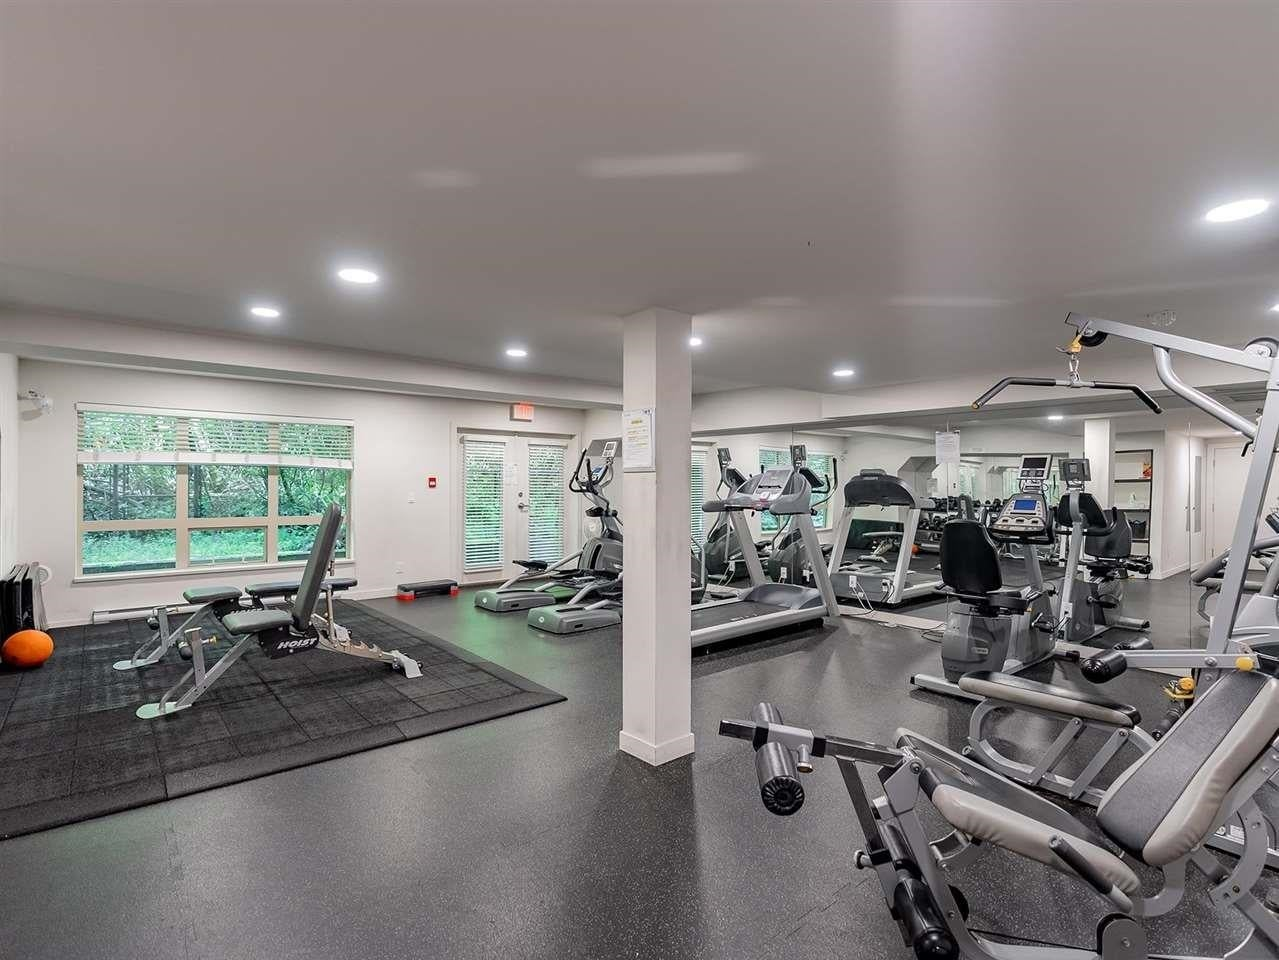 506 1677 LLOYD AVENUE - Pemberton NV Apartment/Condo for sale, 1 Bedroom (R2624695) - #22